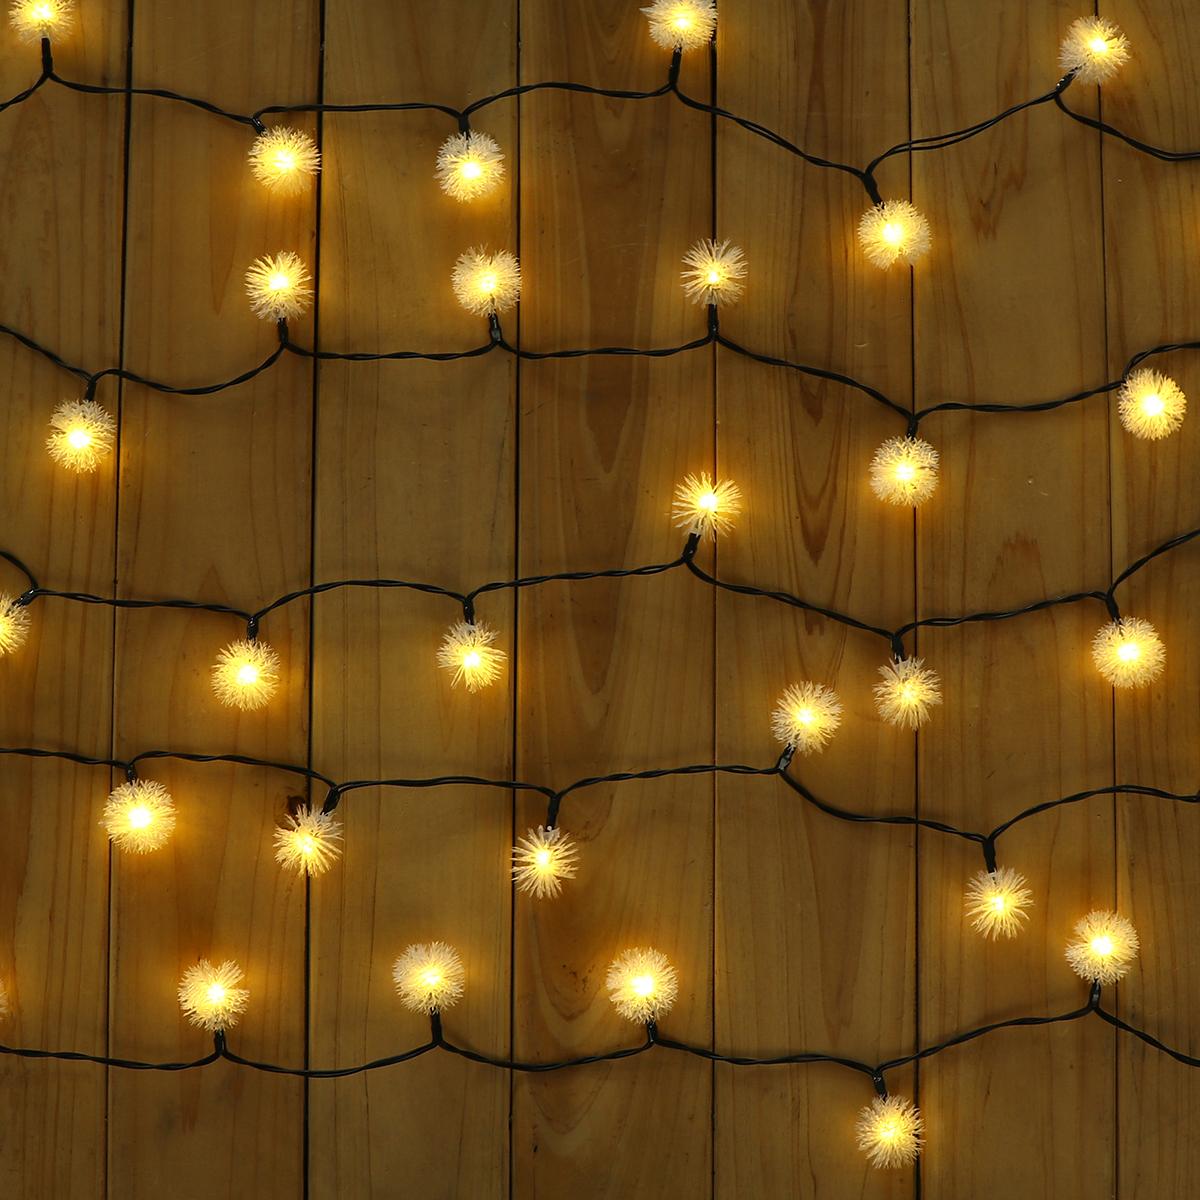 30 LED Solar Power Christmas Fairy String Lights Party Outdoor Patio Decor Lamp Creative Light